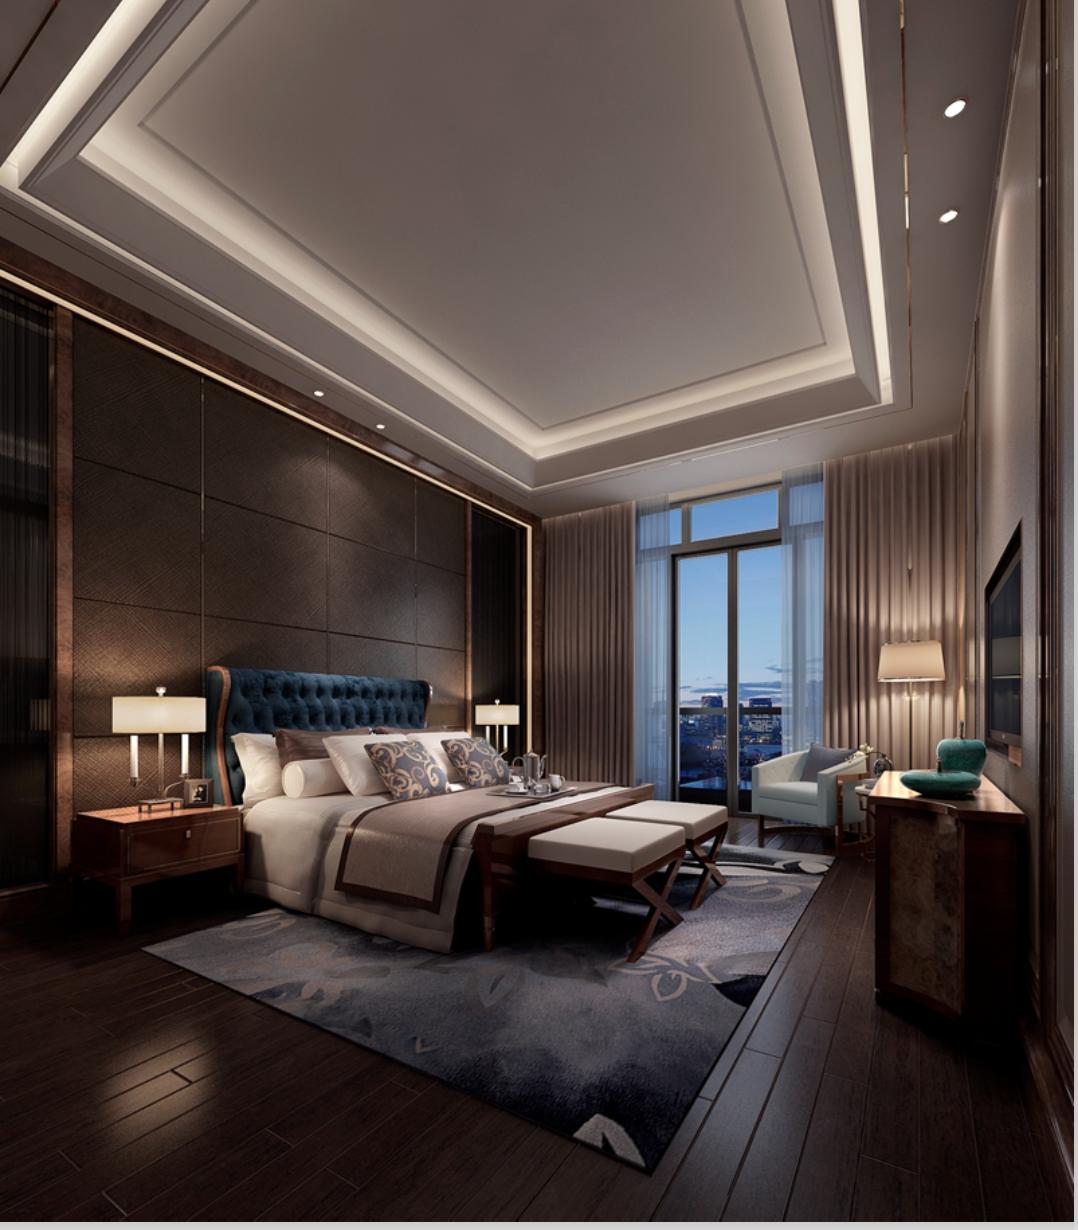 romantic bedroom ultra luxurious luxury bedroom master on romantic trend master bedroom ideas id=90446